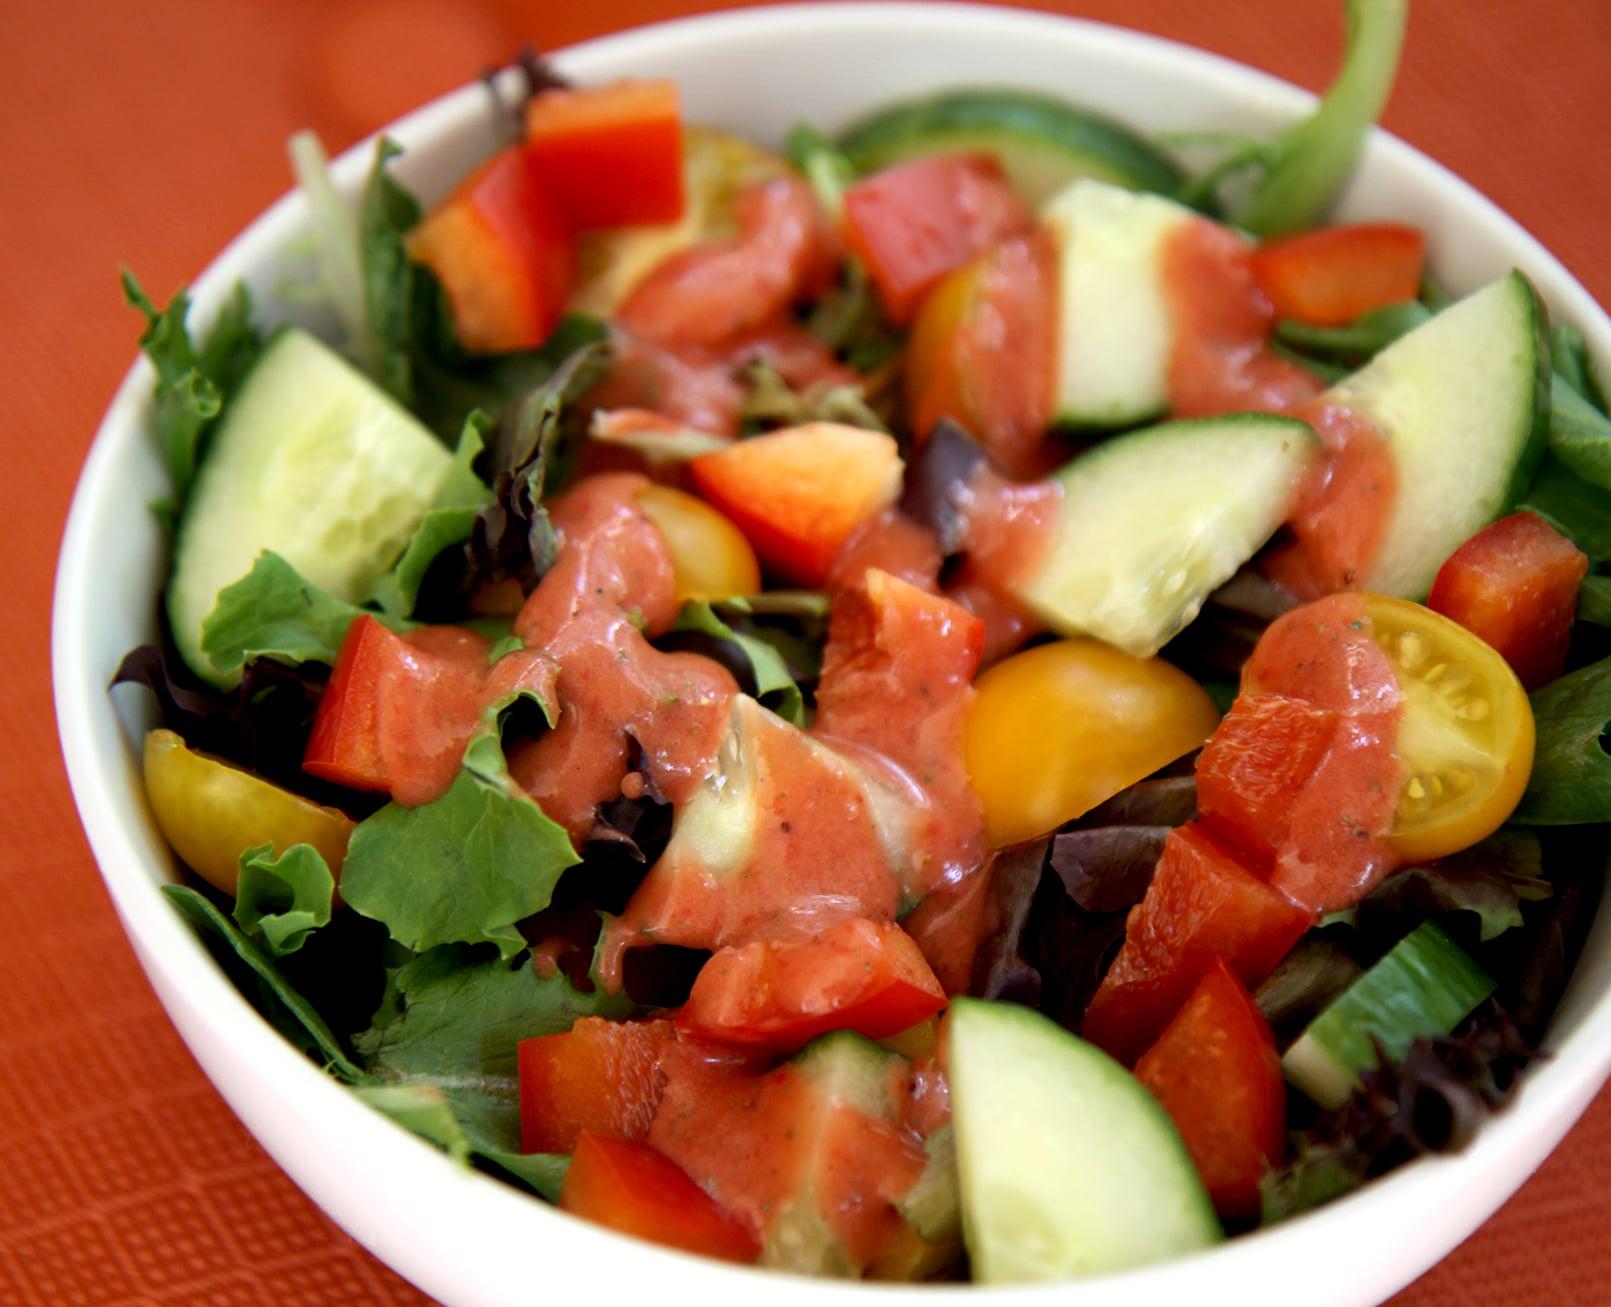 Bring a Huge Salad For Lunch